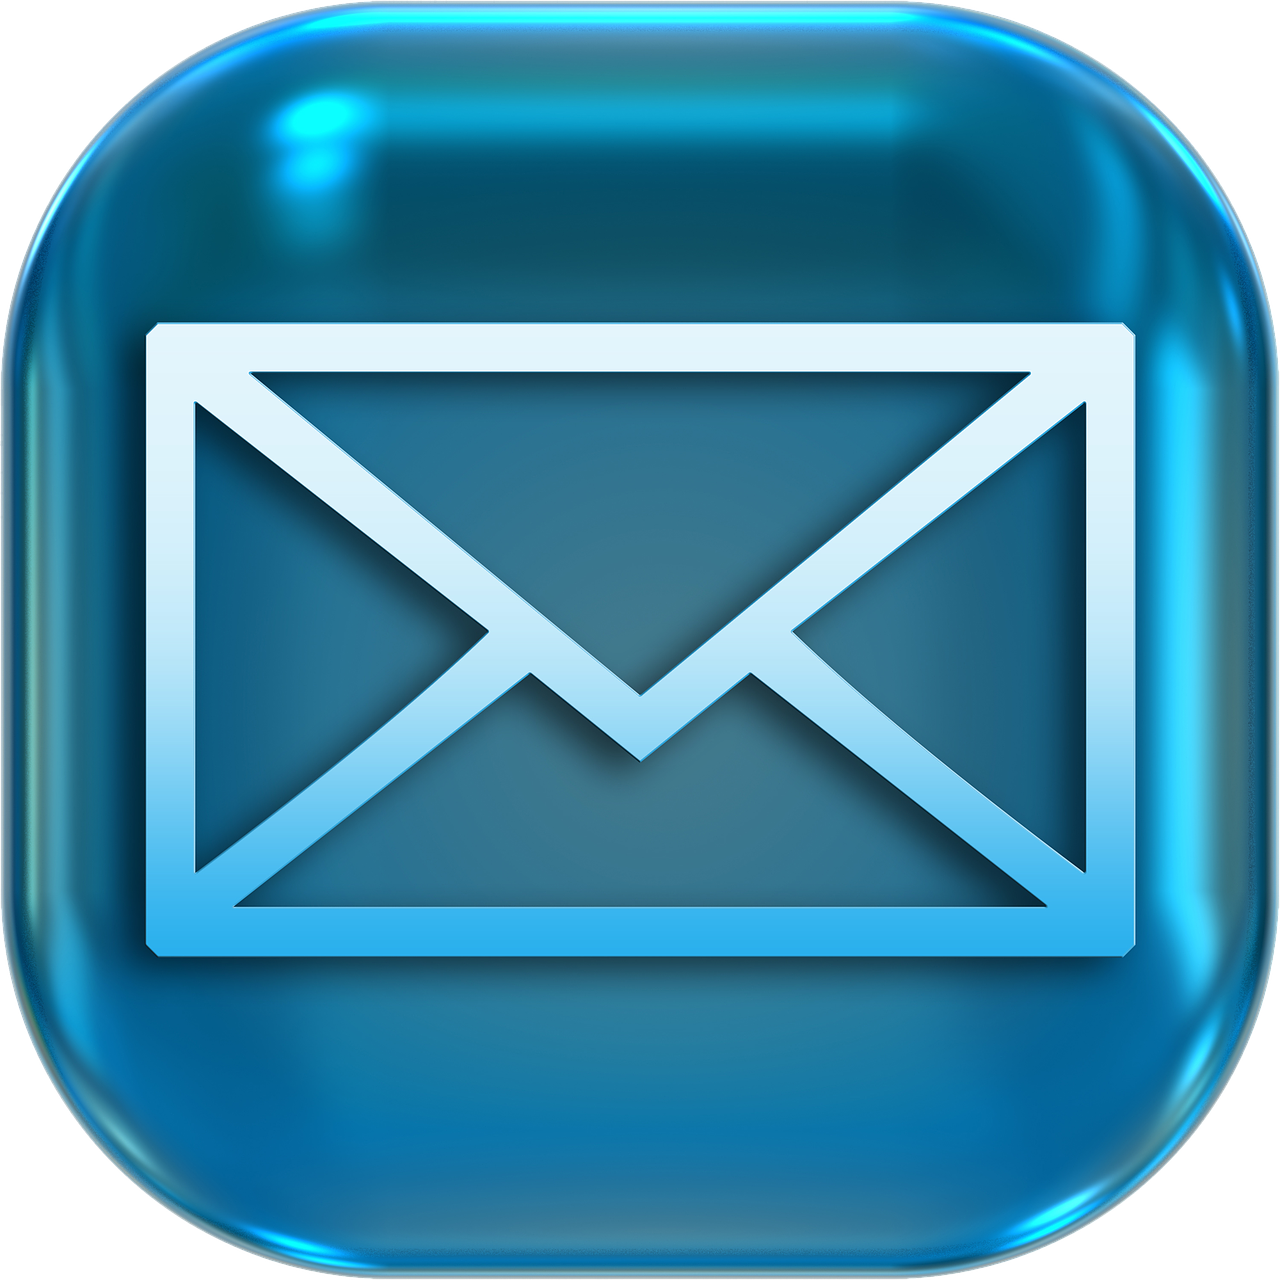 icons, symbols, letter-842848.jpg